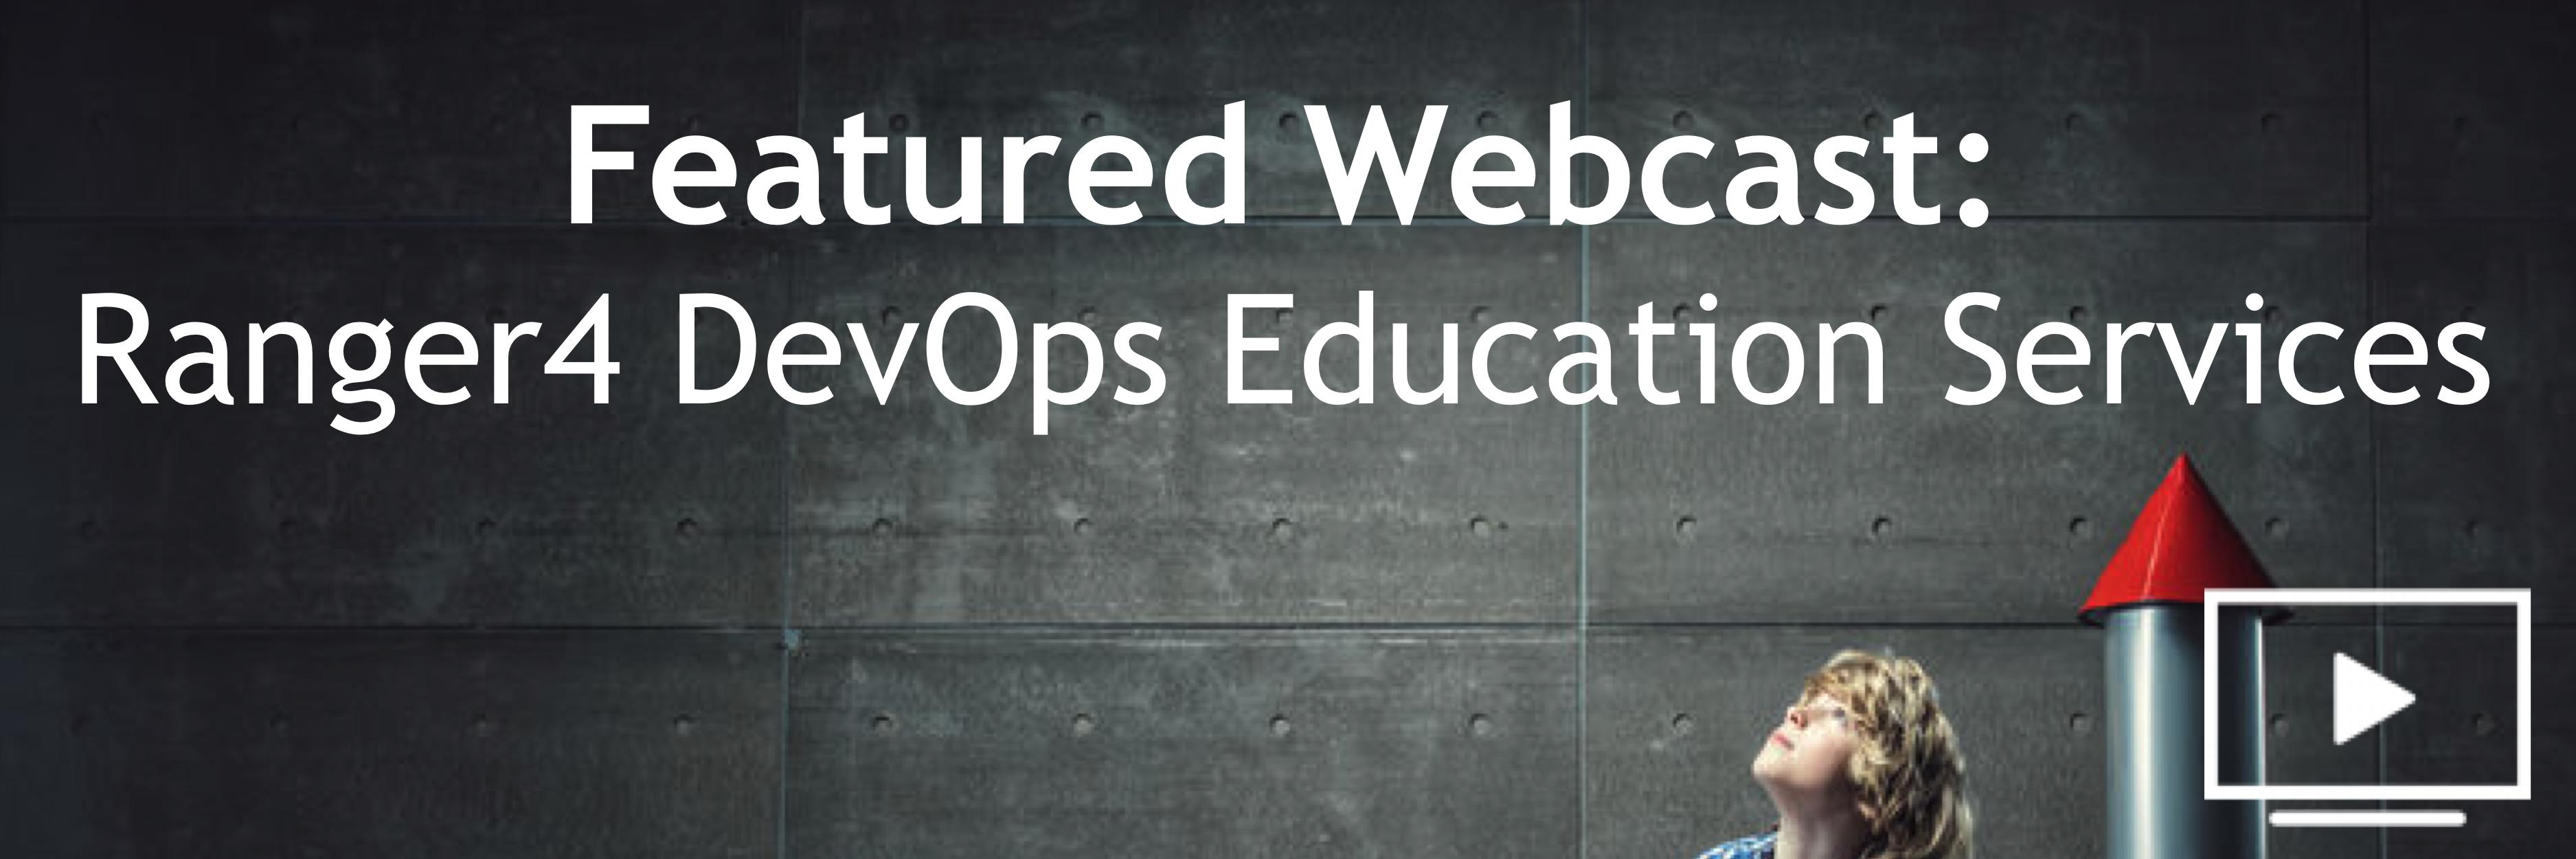 Ranger4 DevOps Education Services webcast about us page banner-3.png